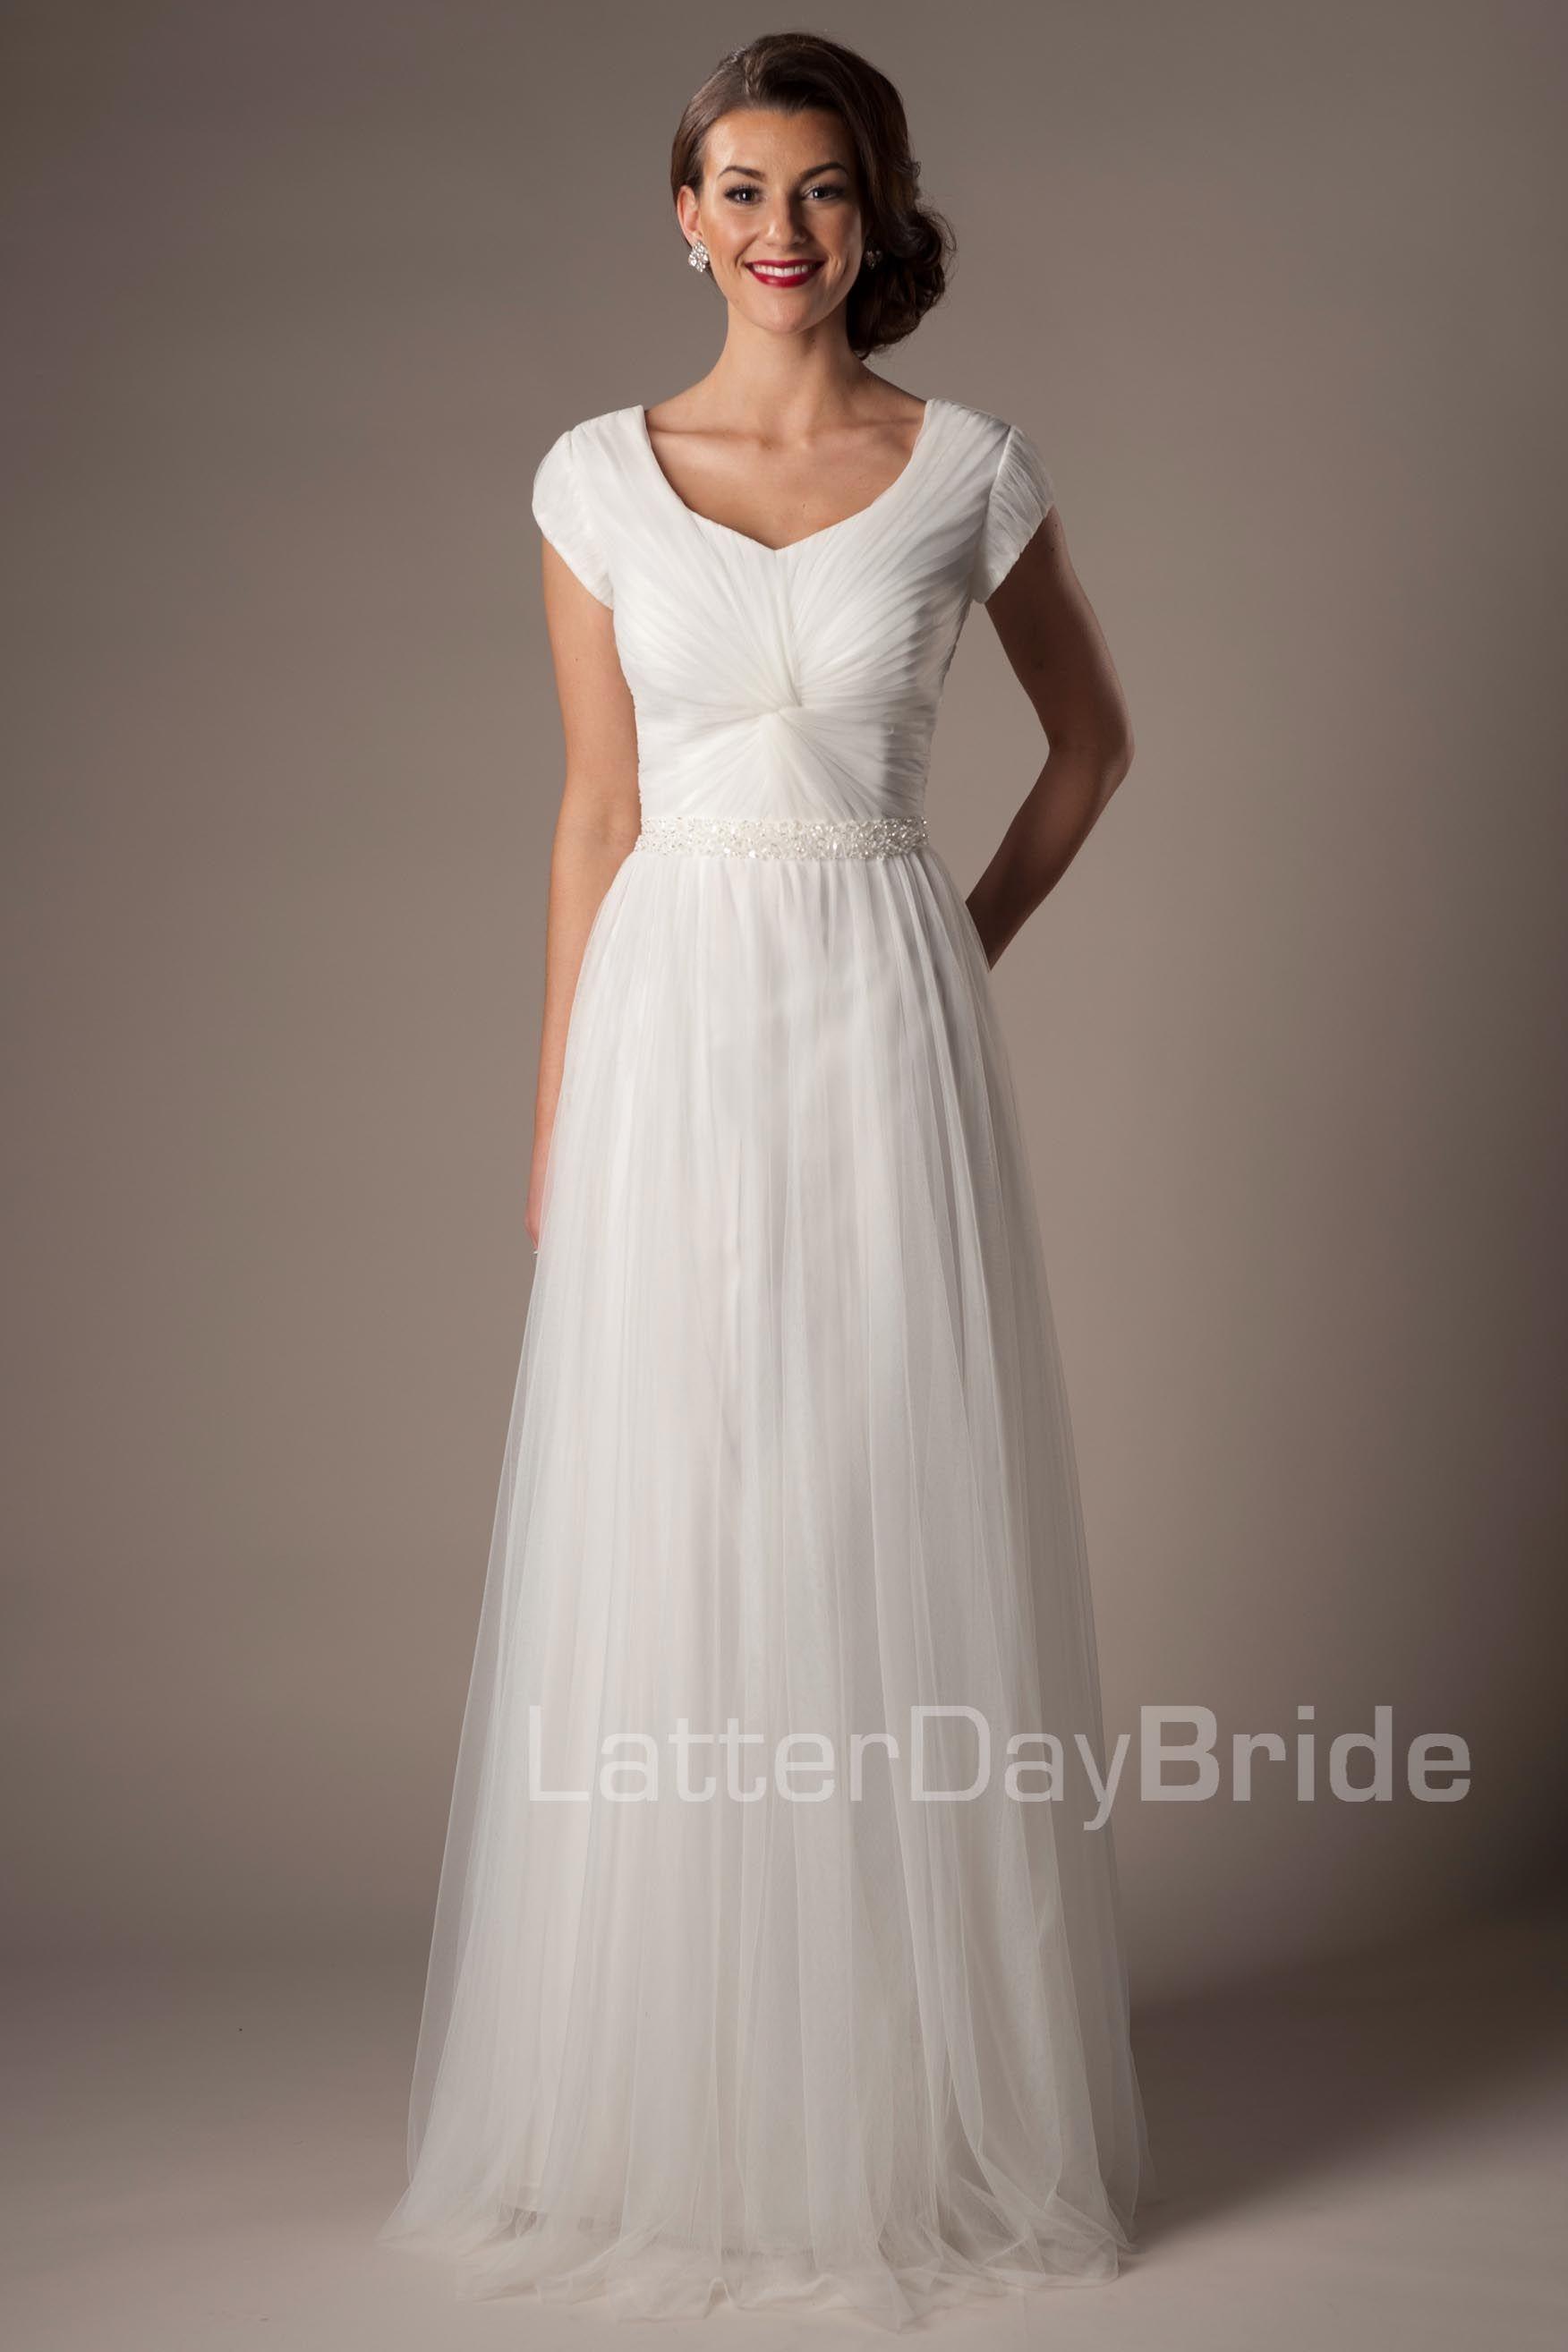 Plus size wedding dresses castleford - Middleton Modest Wedding Dress